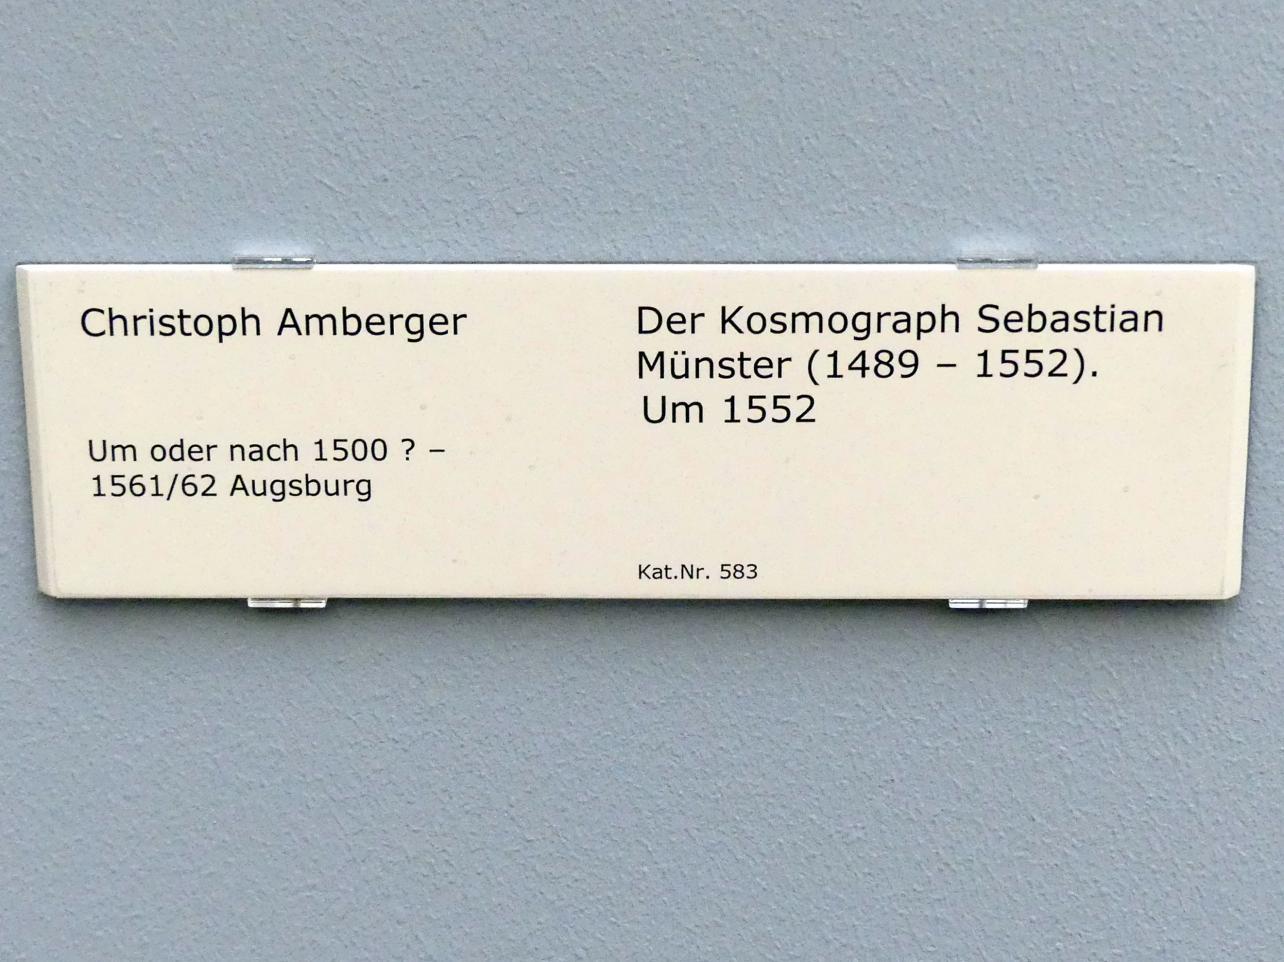 Christoph Amberger: Der Kosmograph Sebastian Münster (1489-1552), um 1552, Bild 2/2